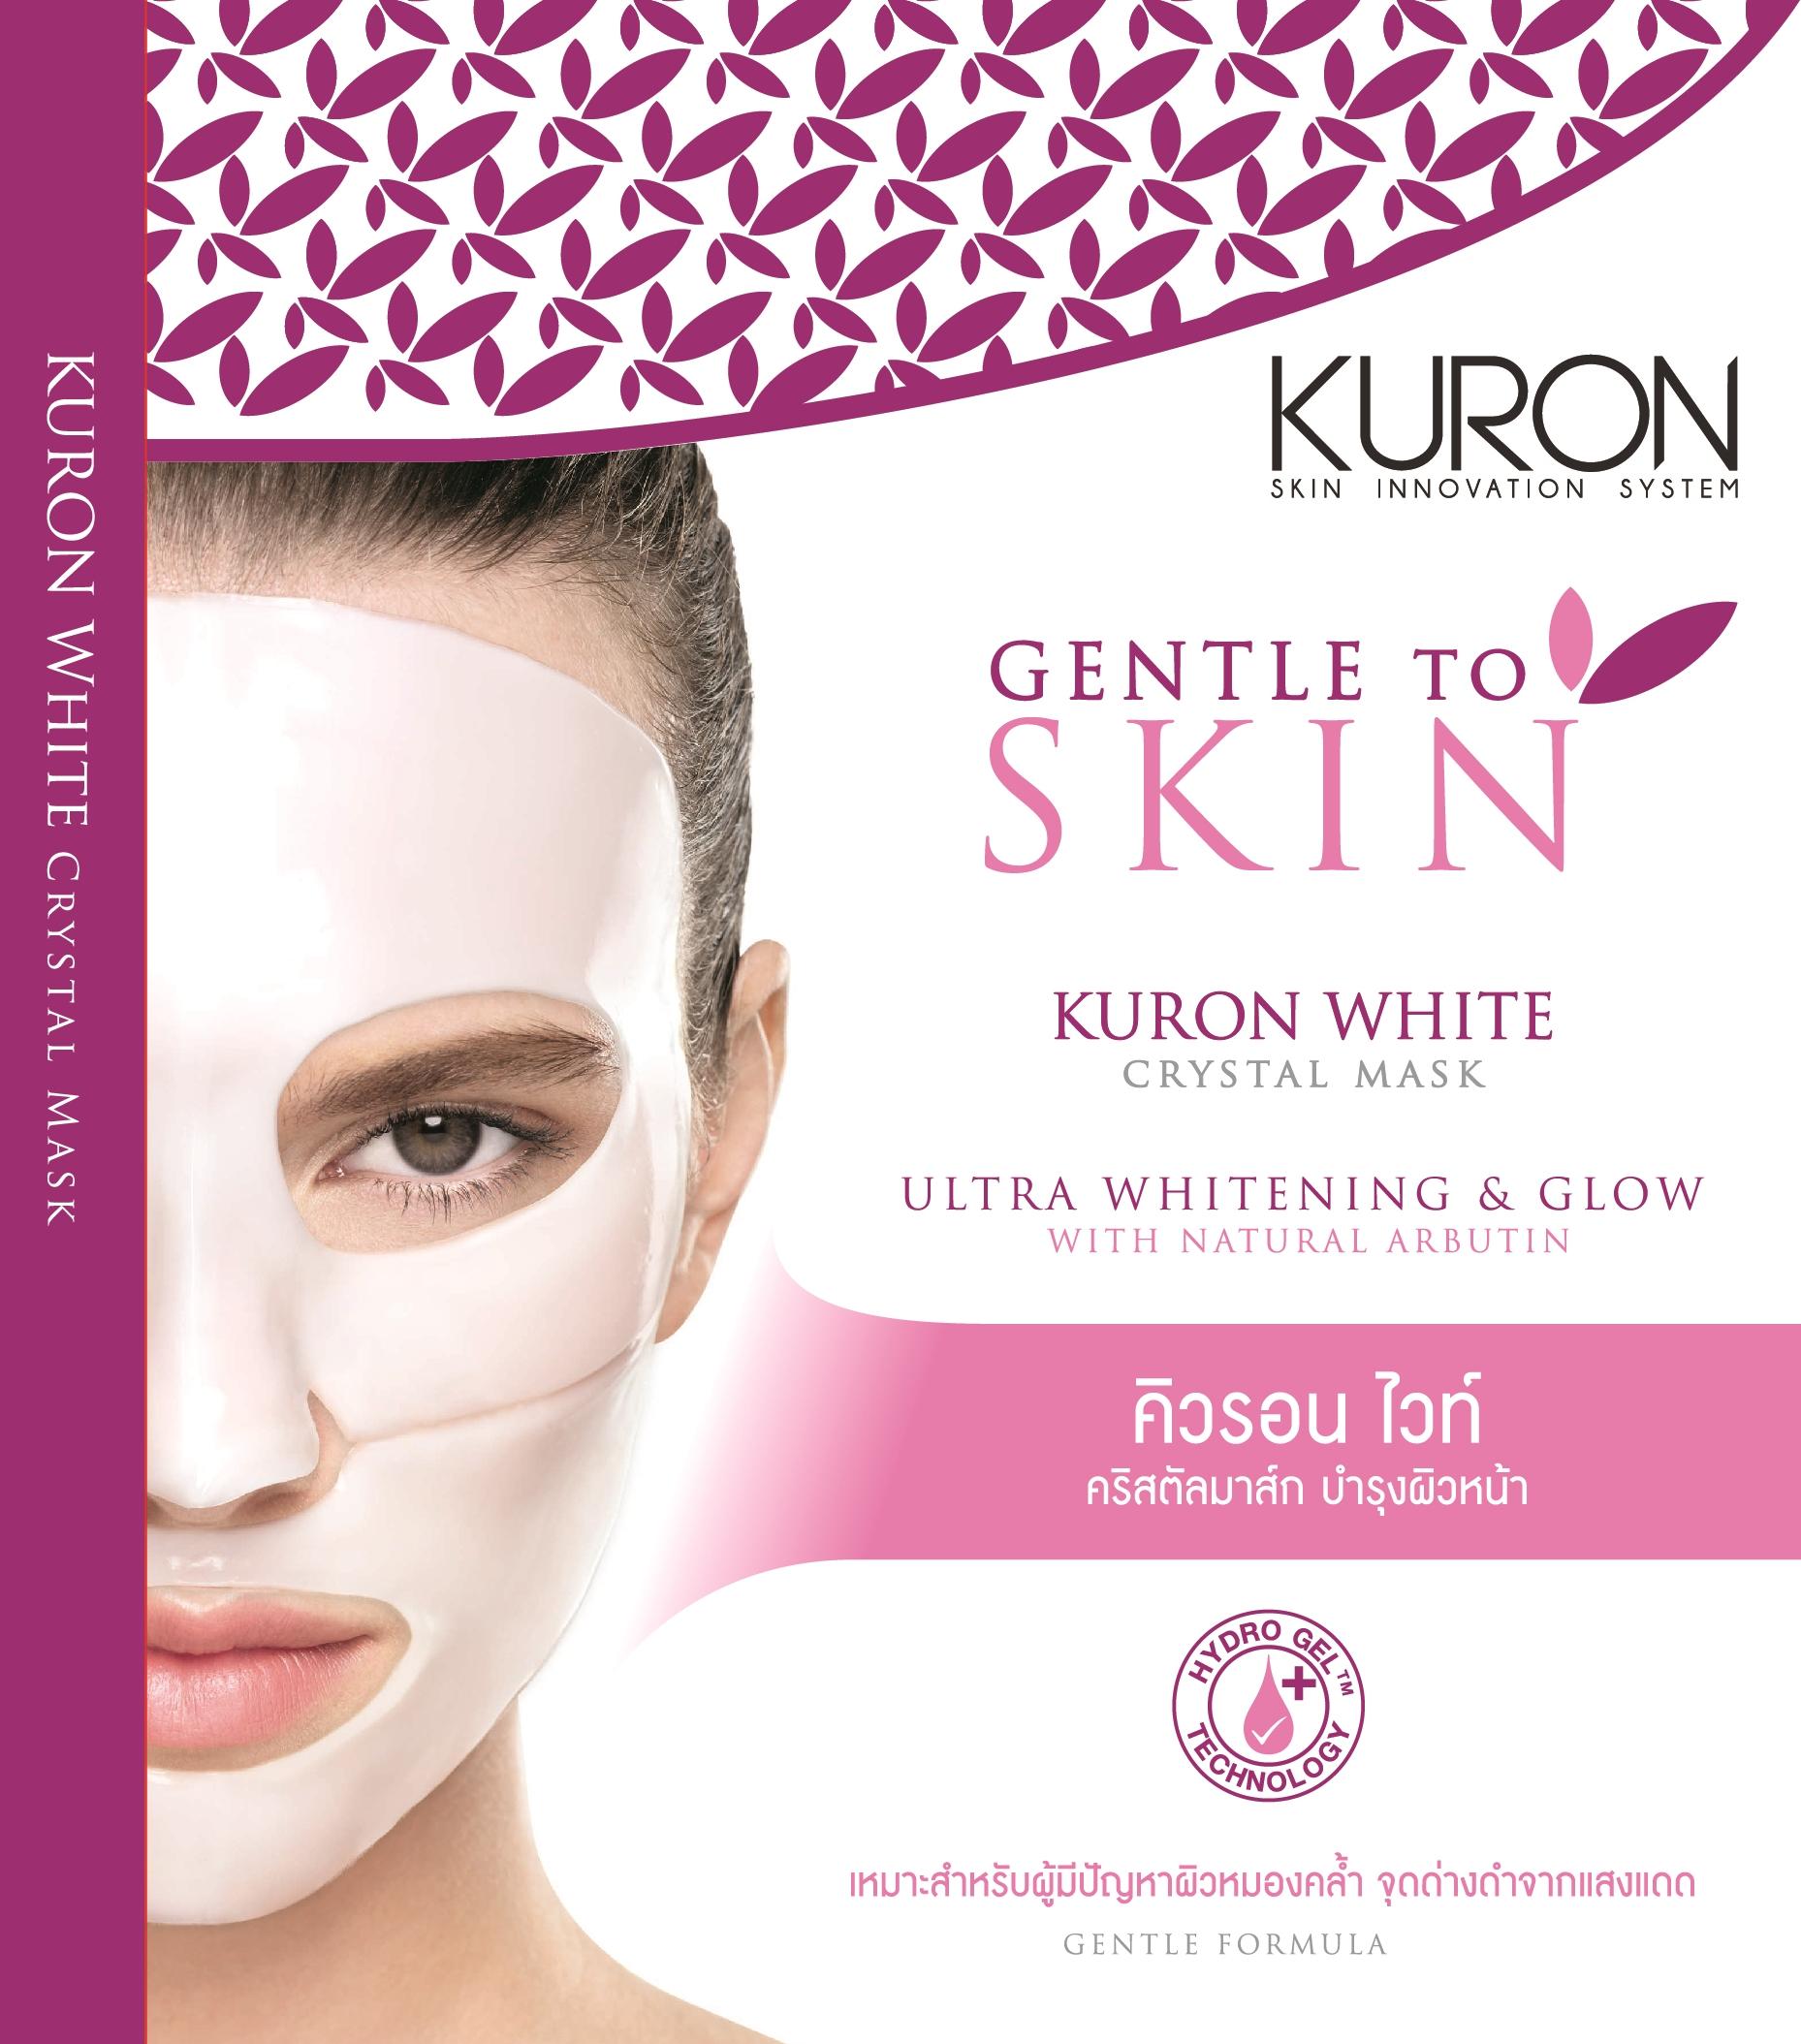 Kuron White Crystal Mask Hydro Gel มาส์กเนื้อเจล